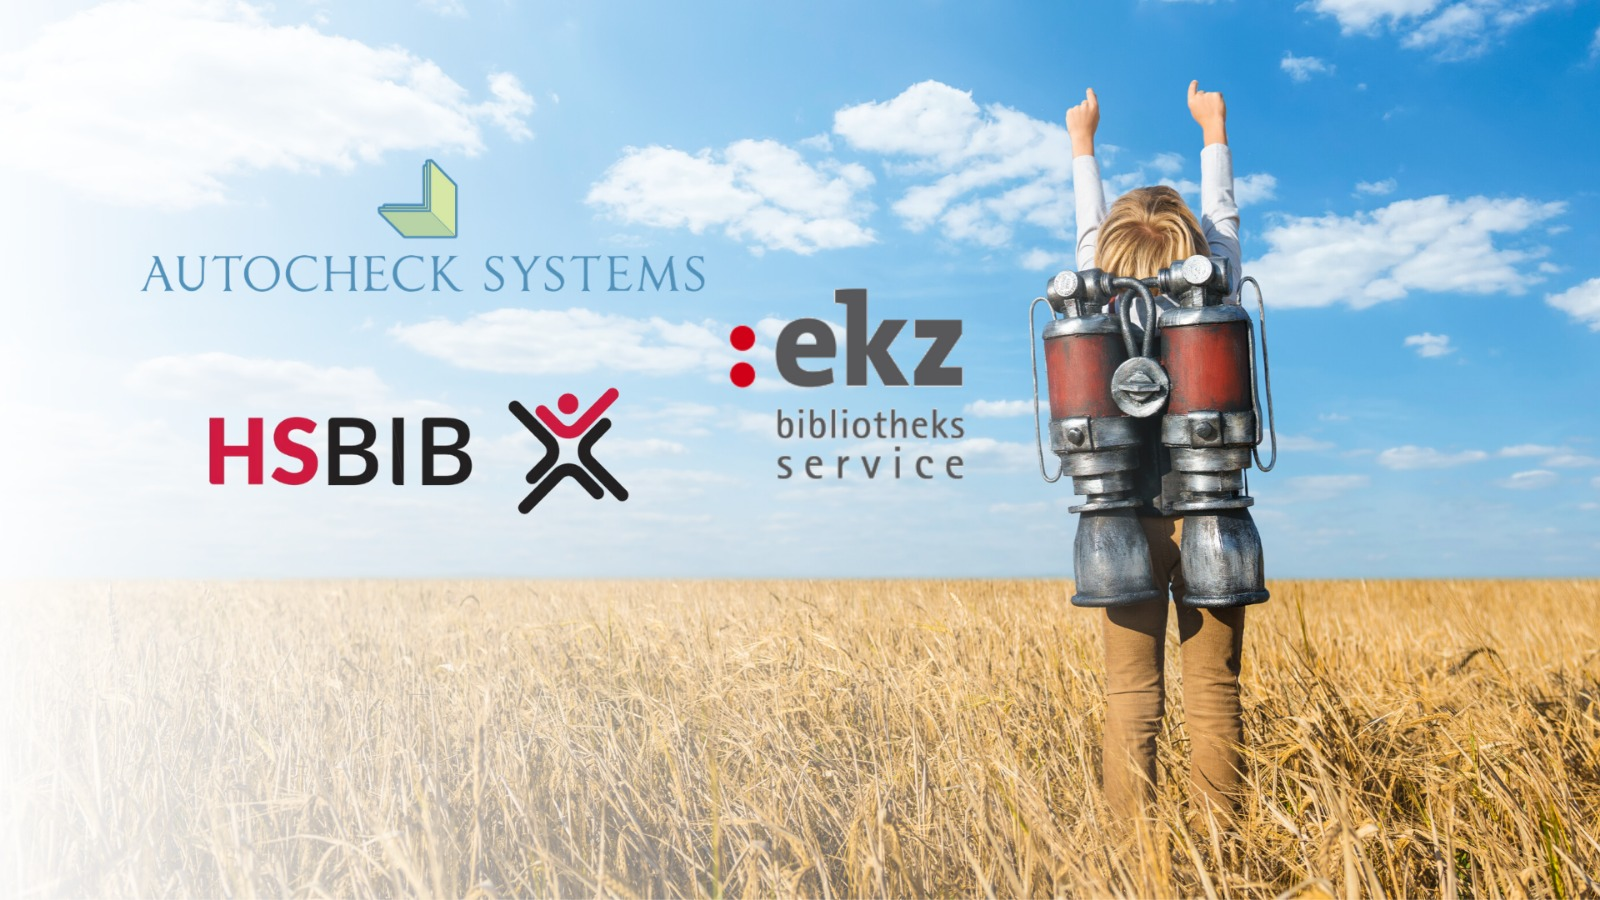 Autocheck Systems bevestigd overname van HSbib (i-track)